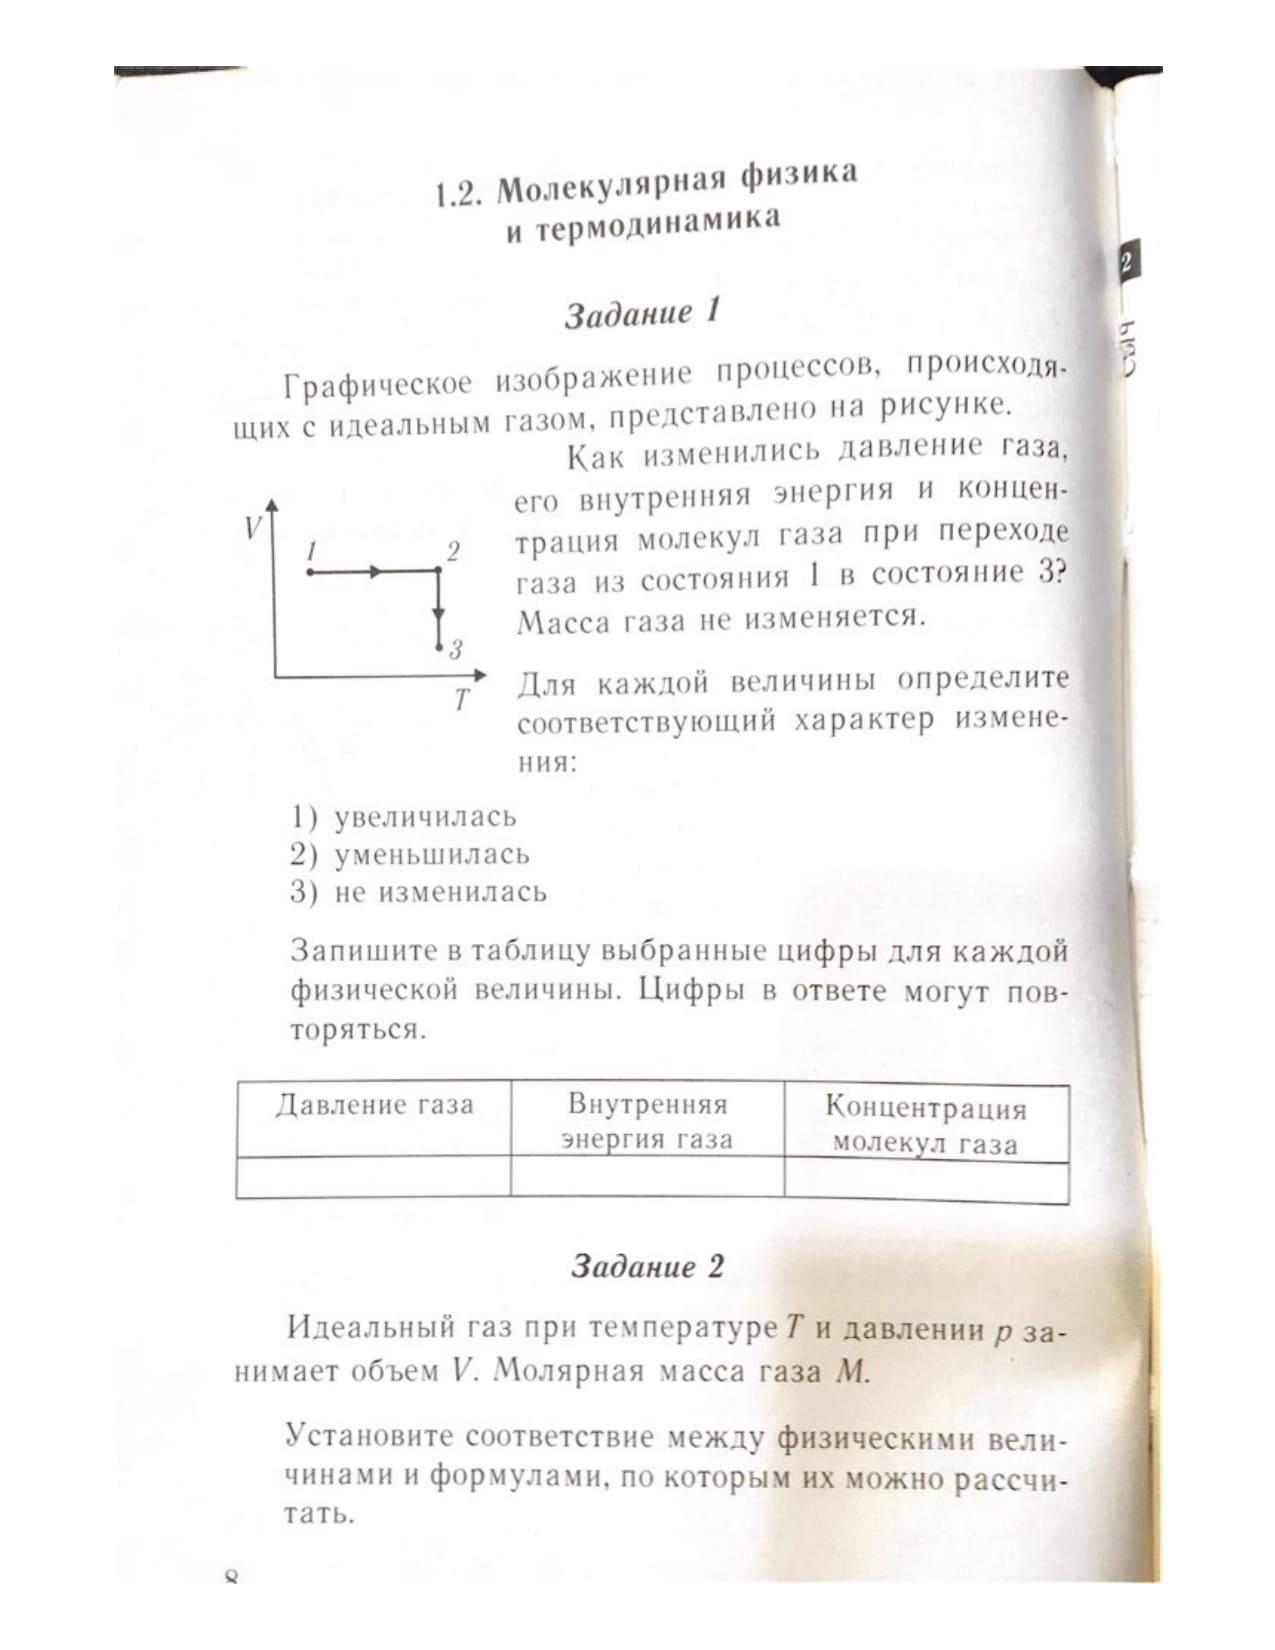 1.2. Молекулярная физика и термодинамика. Задание 1 и 2